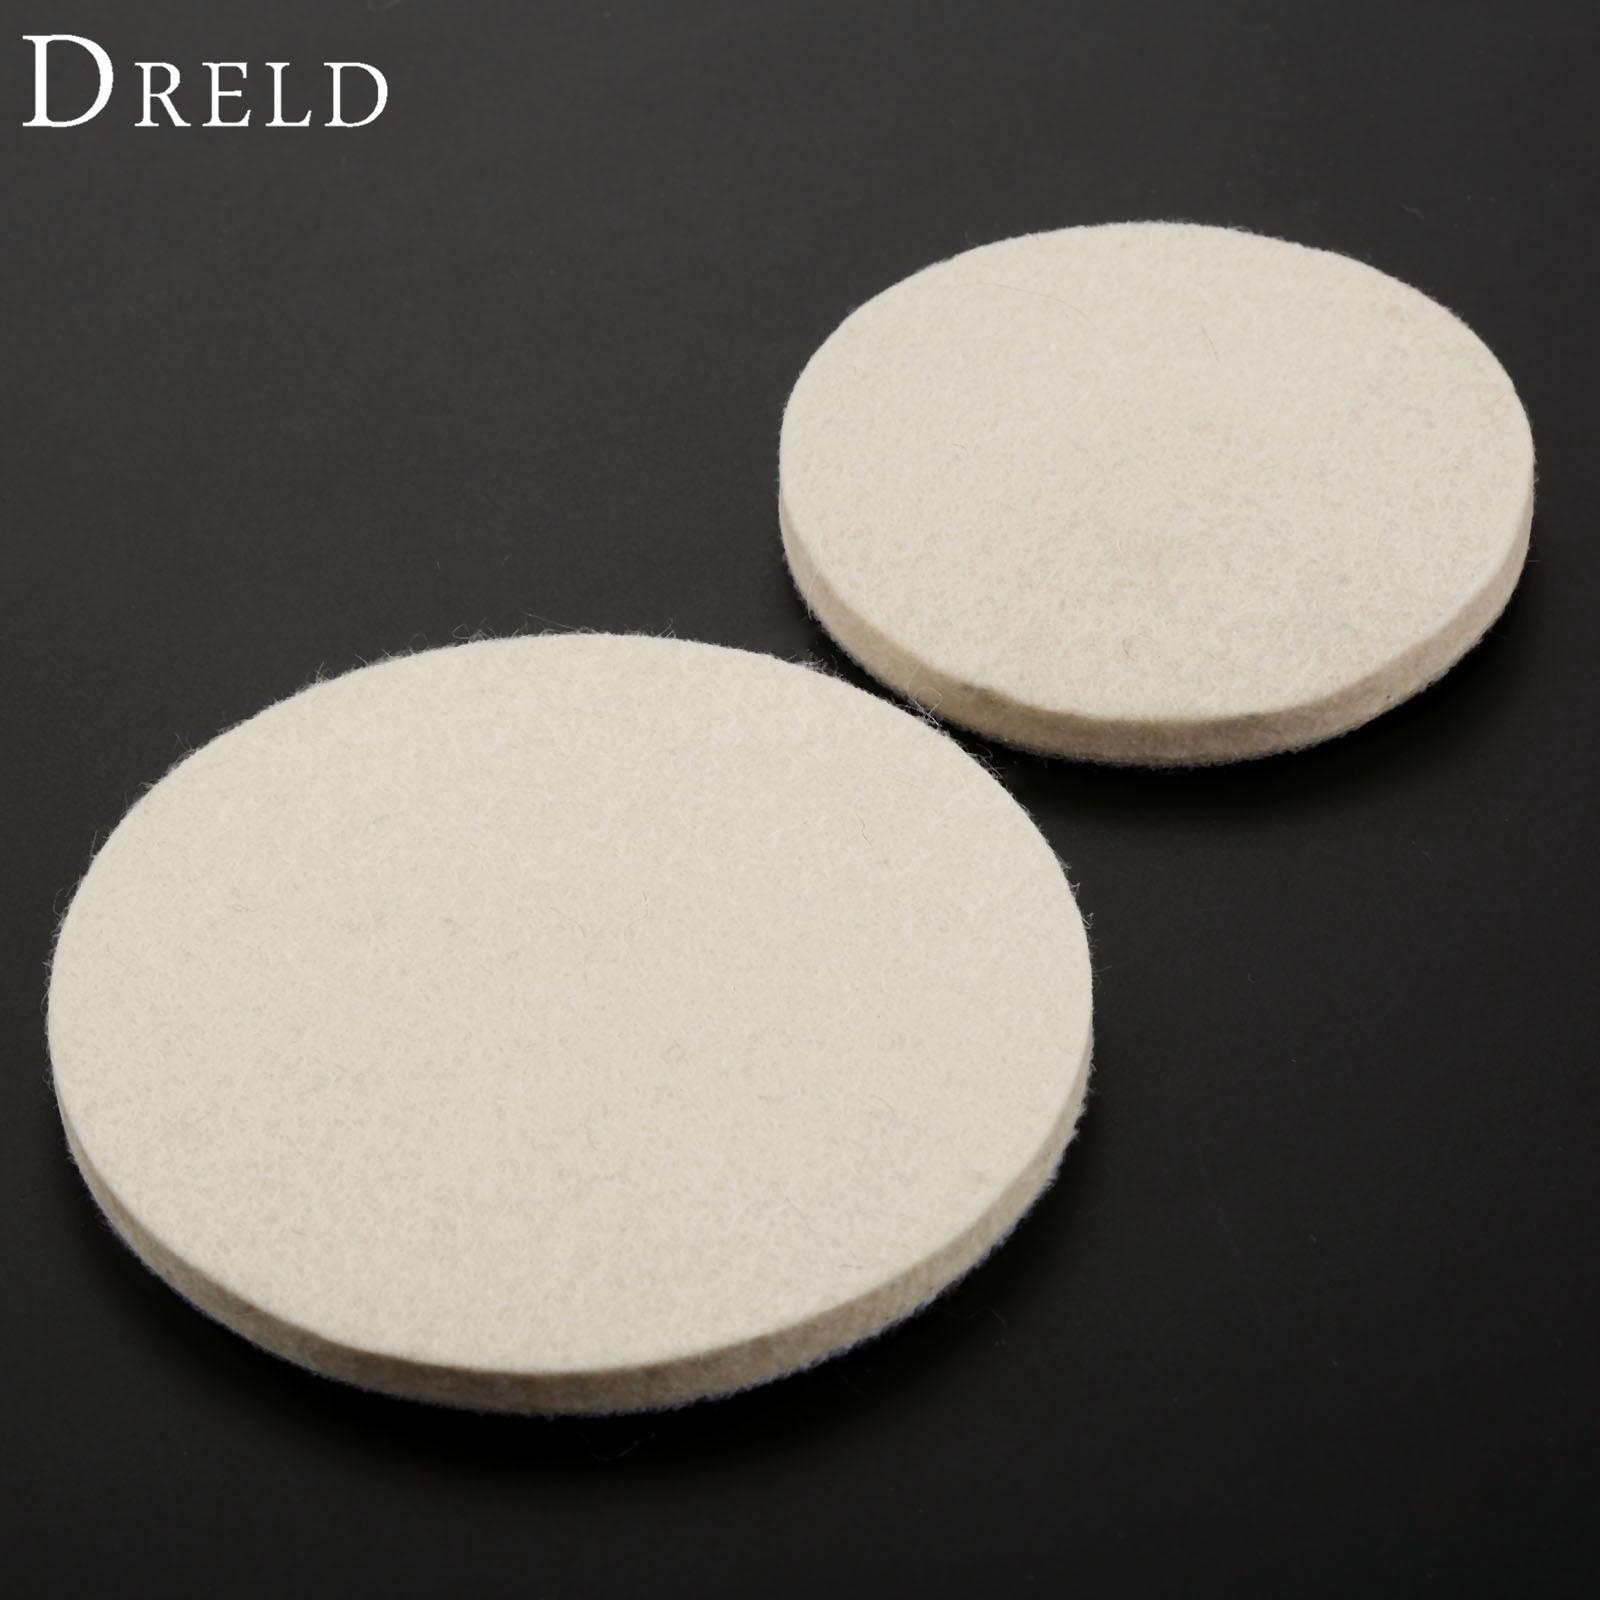 DRELD 1Pc 100mm /125mm Grinding Polishing Buffing Wheel  Dremel Accessories Wool Felt Polish Polisher Disc Pad For Metal Ceramic